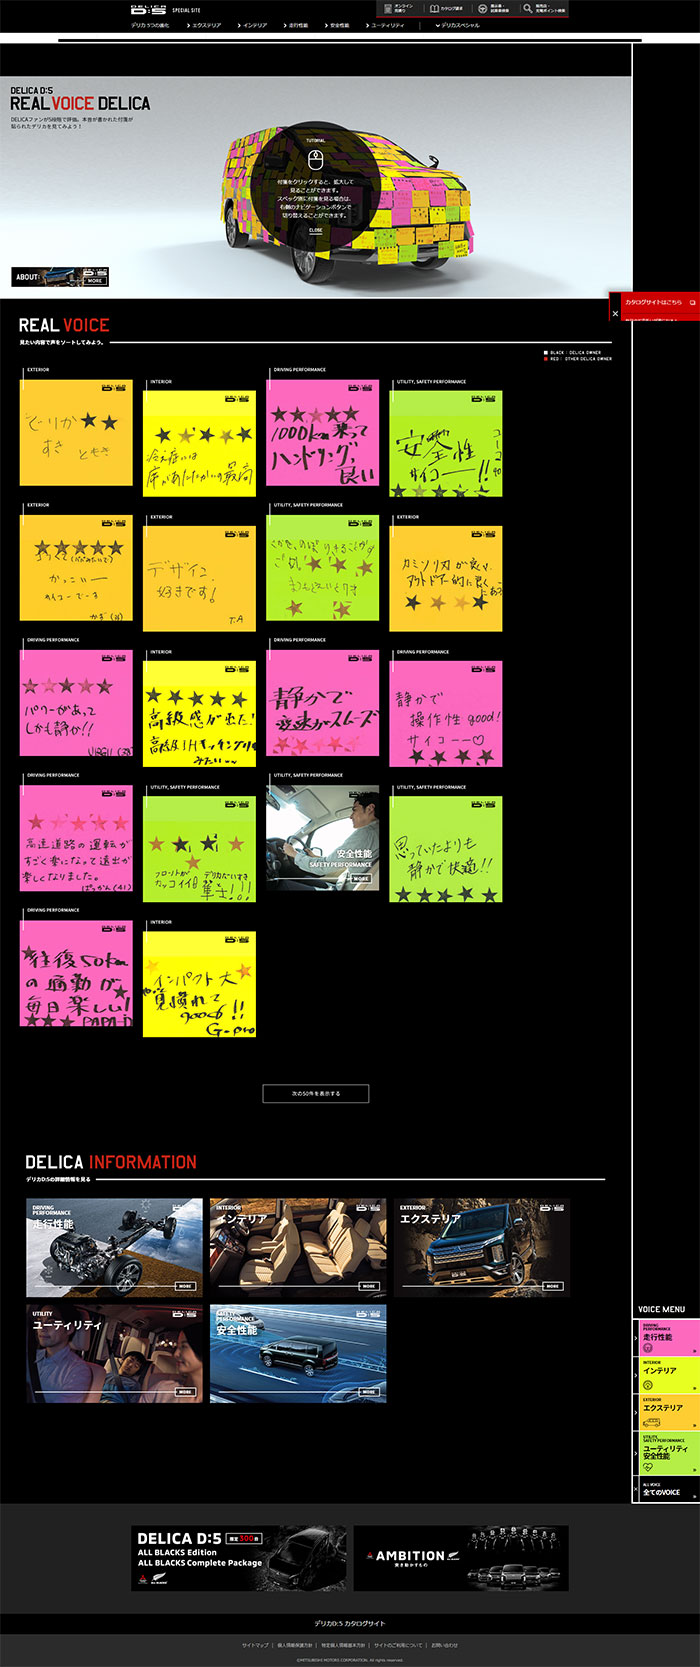 REAL VOICE DELICA | デリカD:5 | MITSUBISHI MOTORS JAPAN